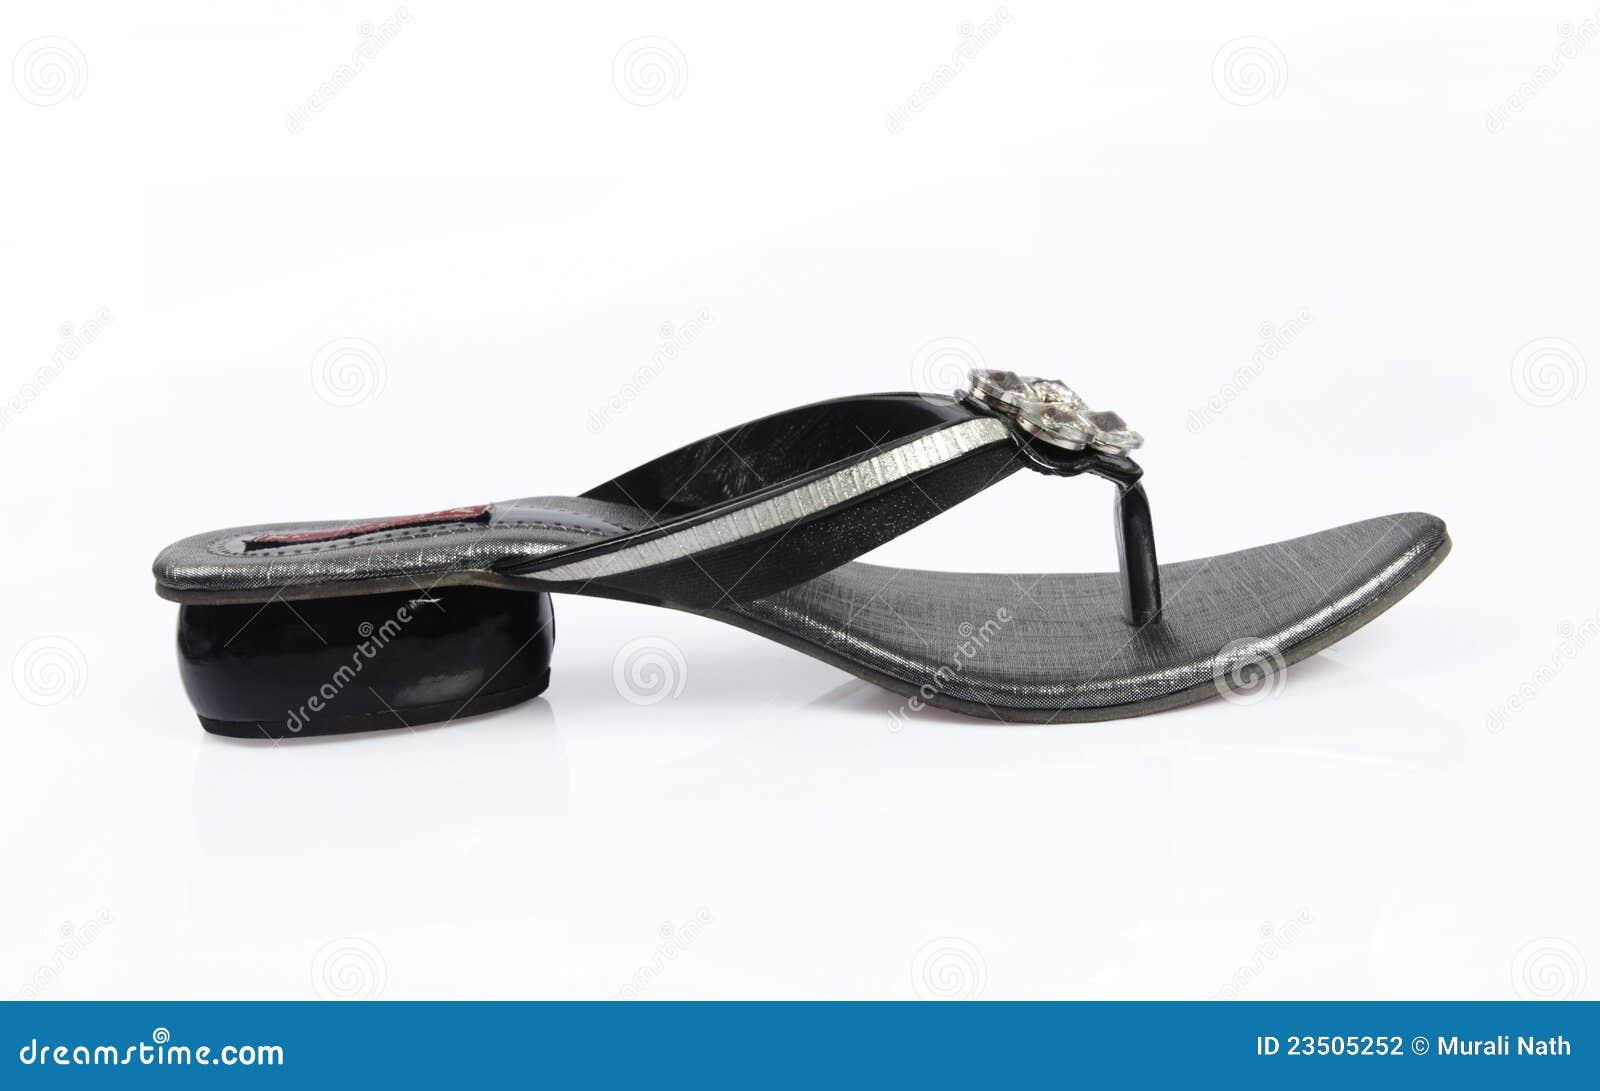 More similar stock images of ` Ladies footwear